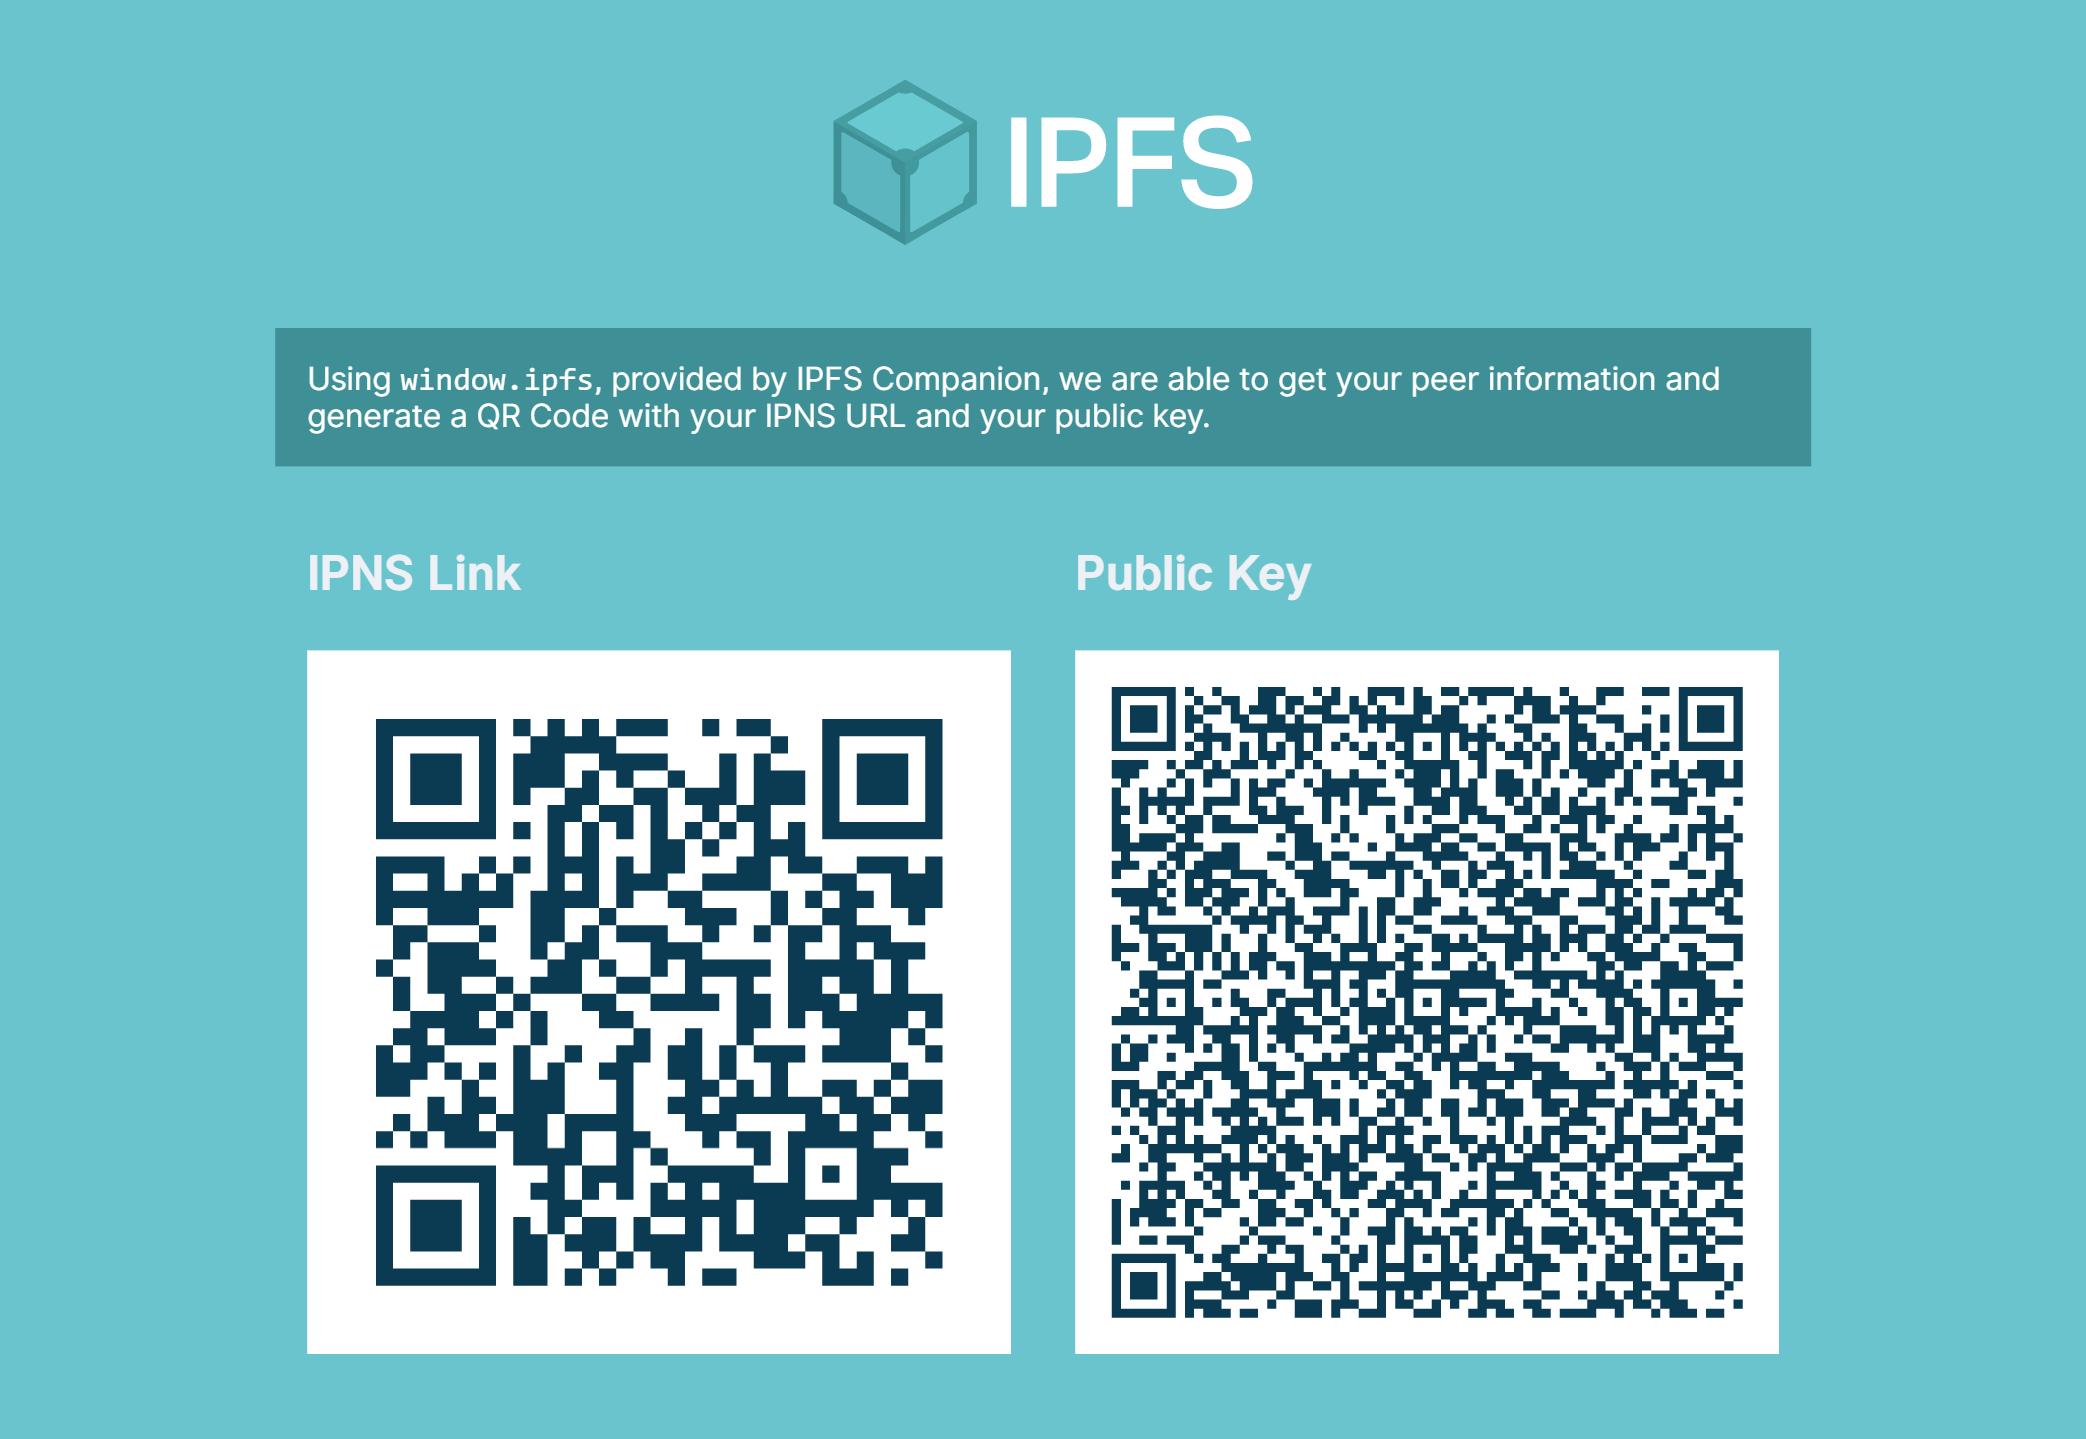 GitHub - ipfs-shipyard/demo-ipfs-id-qr-codes: Generates a QR